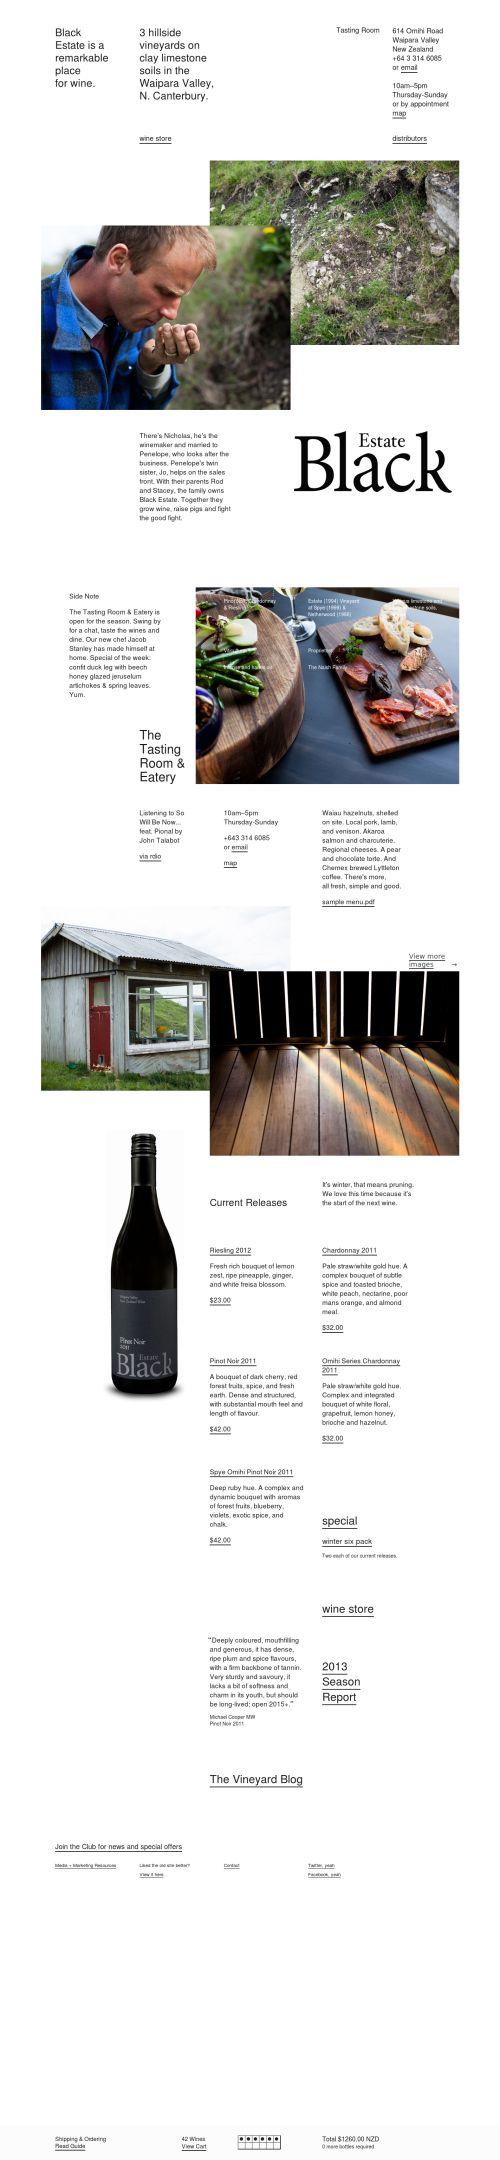 Delectable - Contemporary web design database – Black Estate